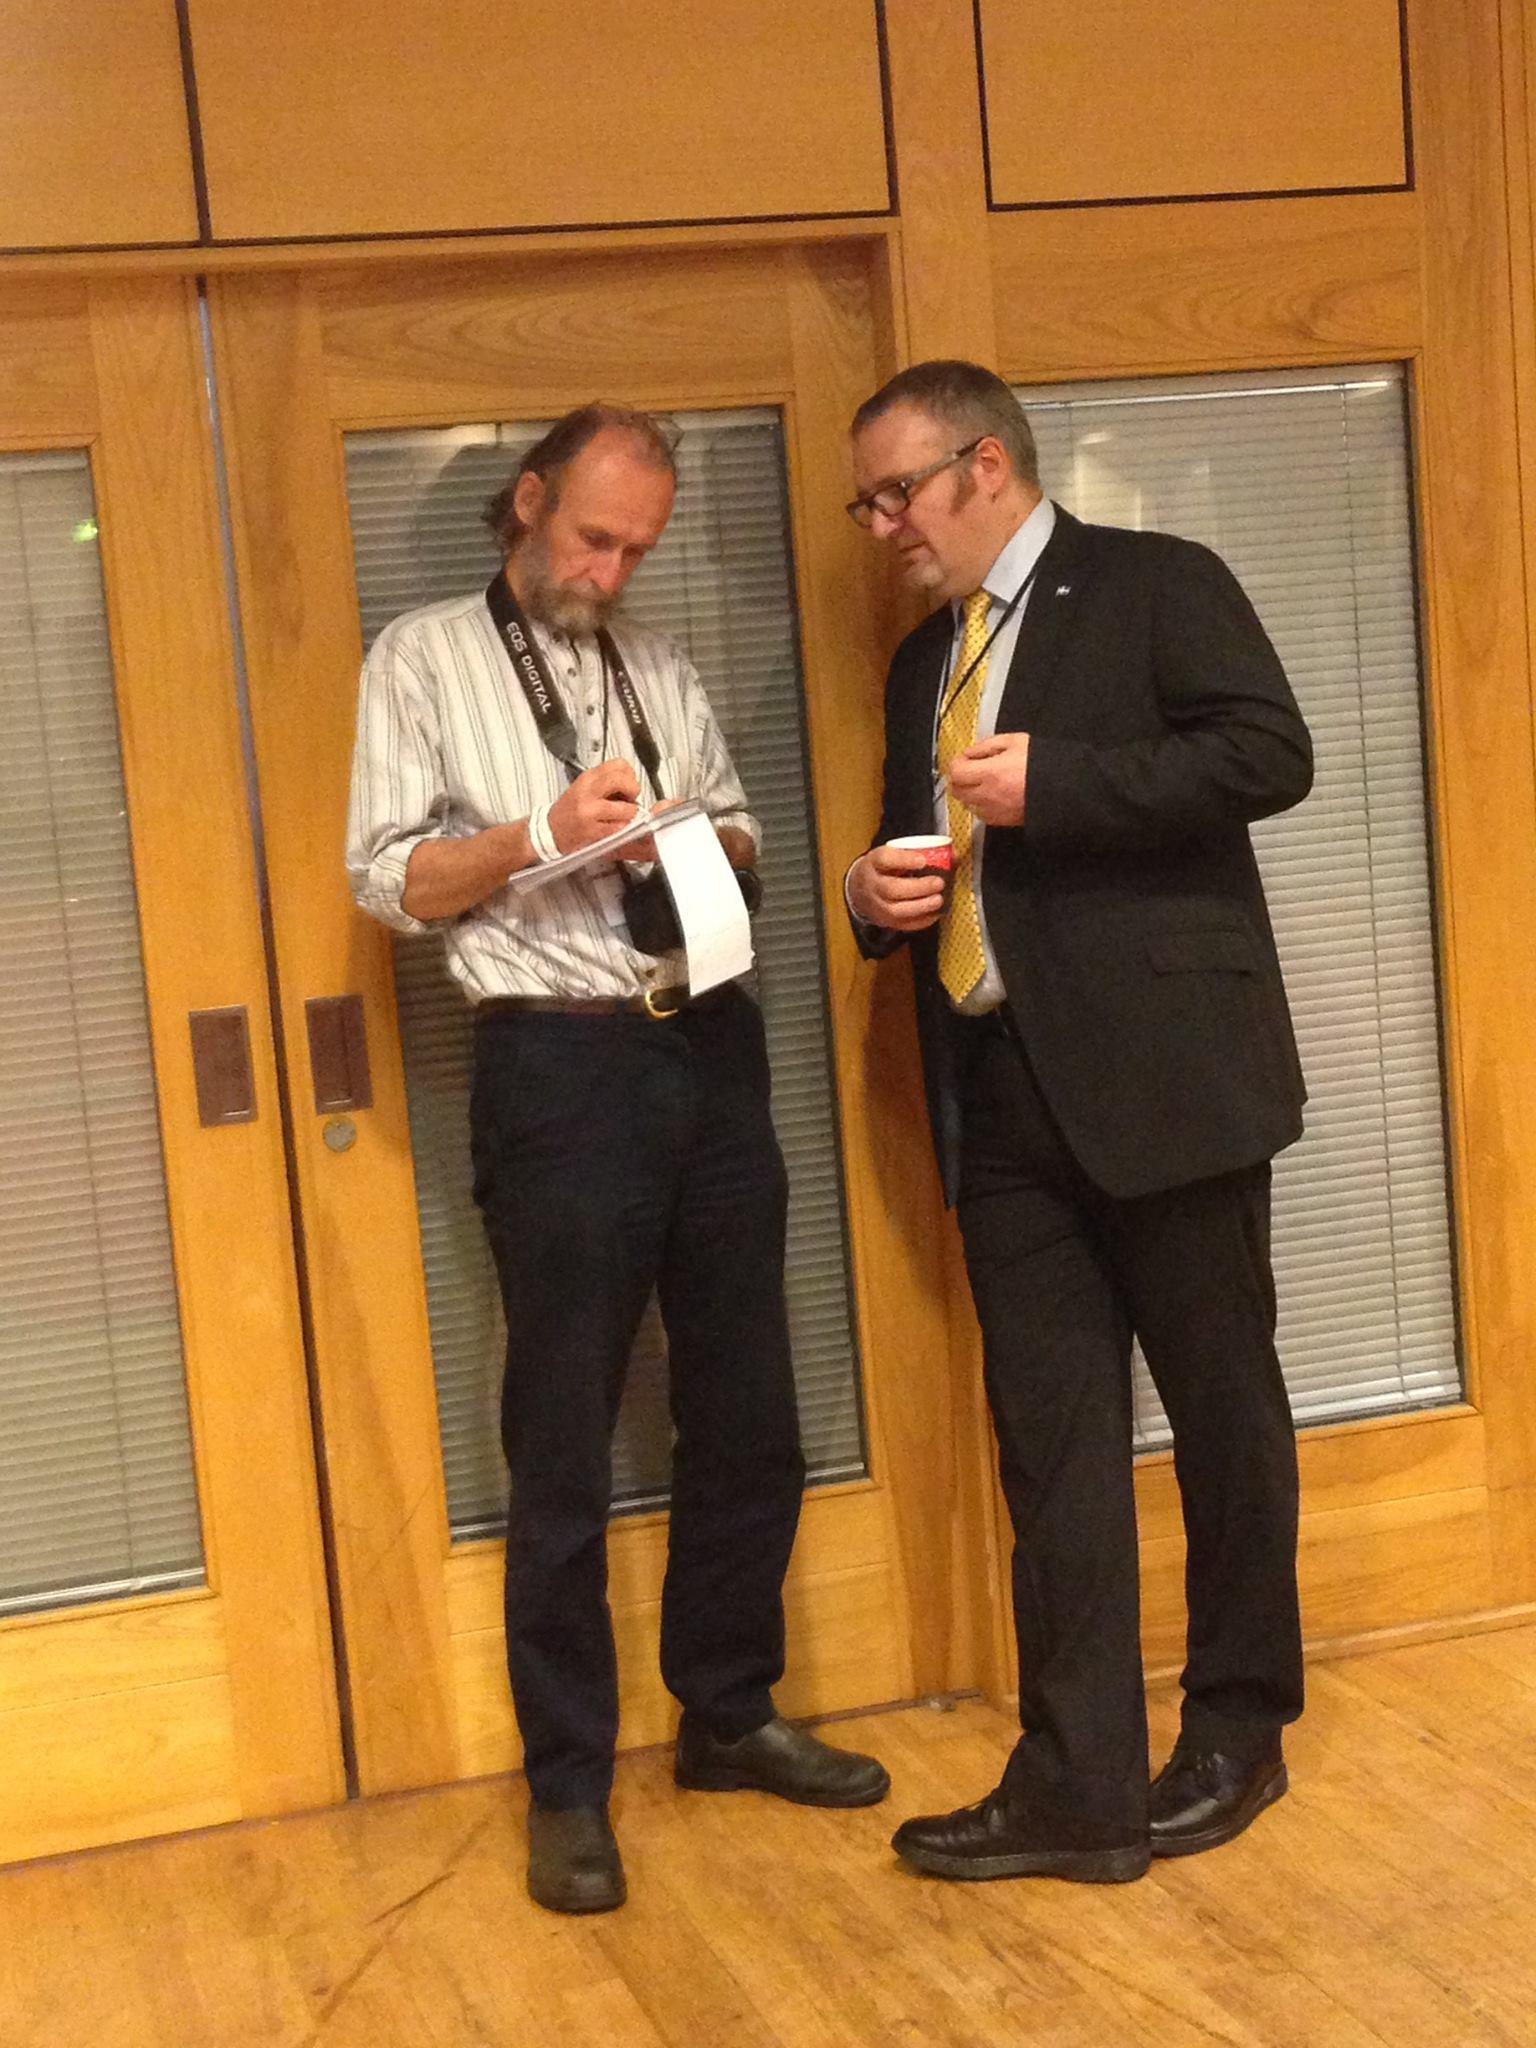 Gary Robinson offering his thoughts to Shetland News' Pete Bevington. Photo courtesy of BBC RadiO Shetland